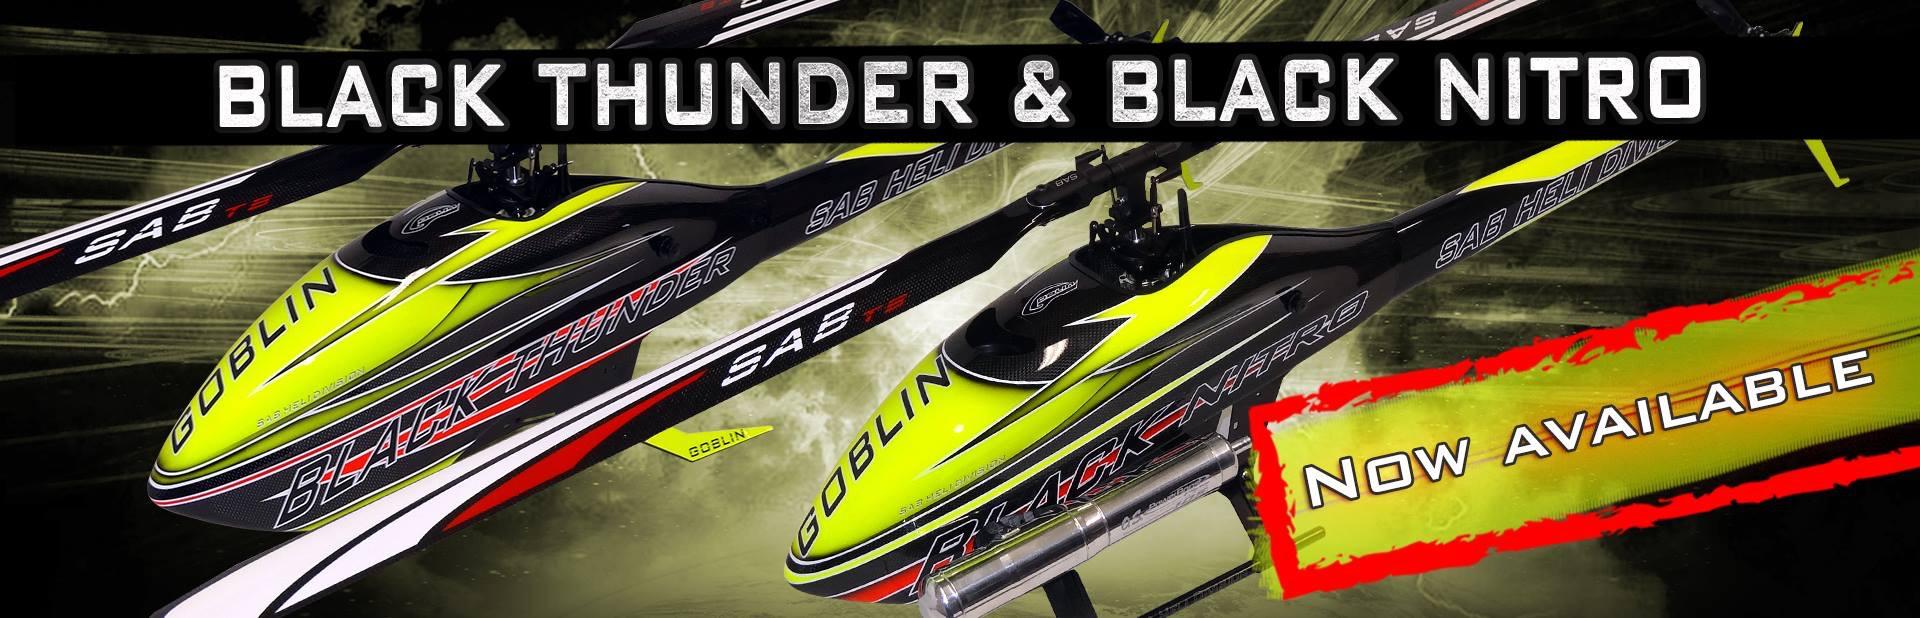 Black Thunder & Black Nitro